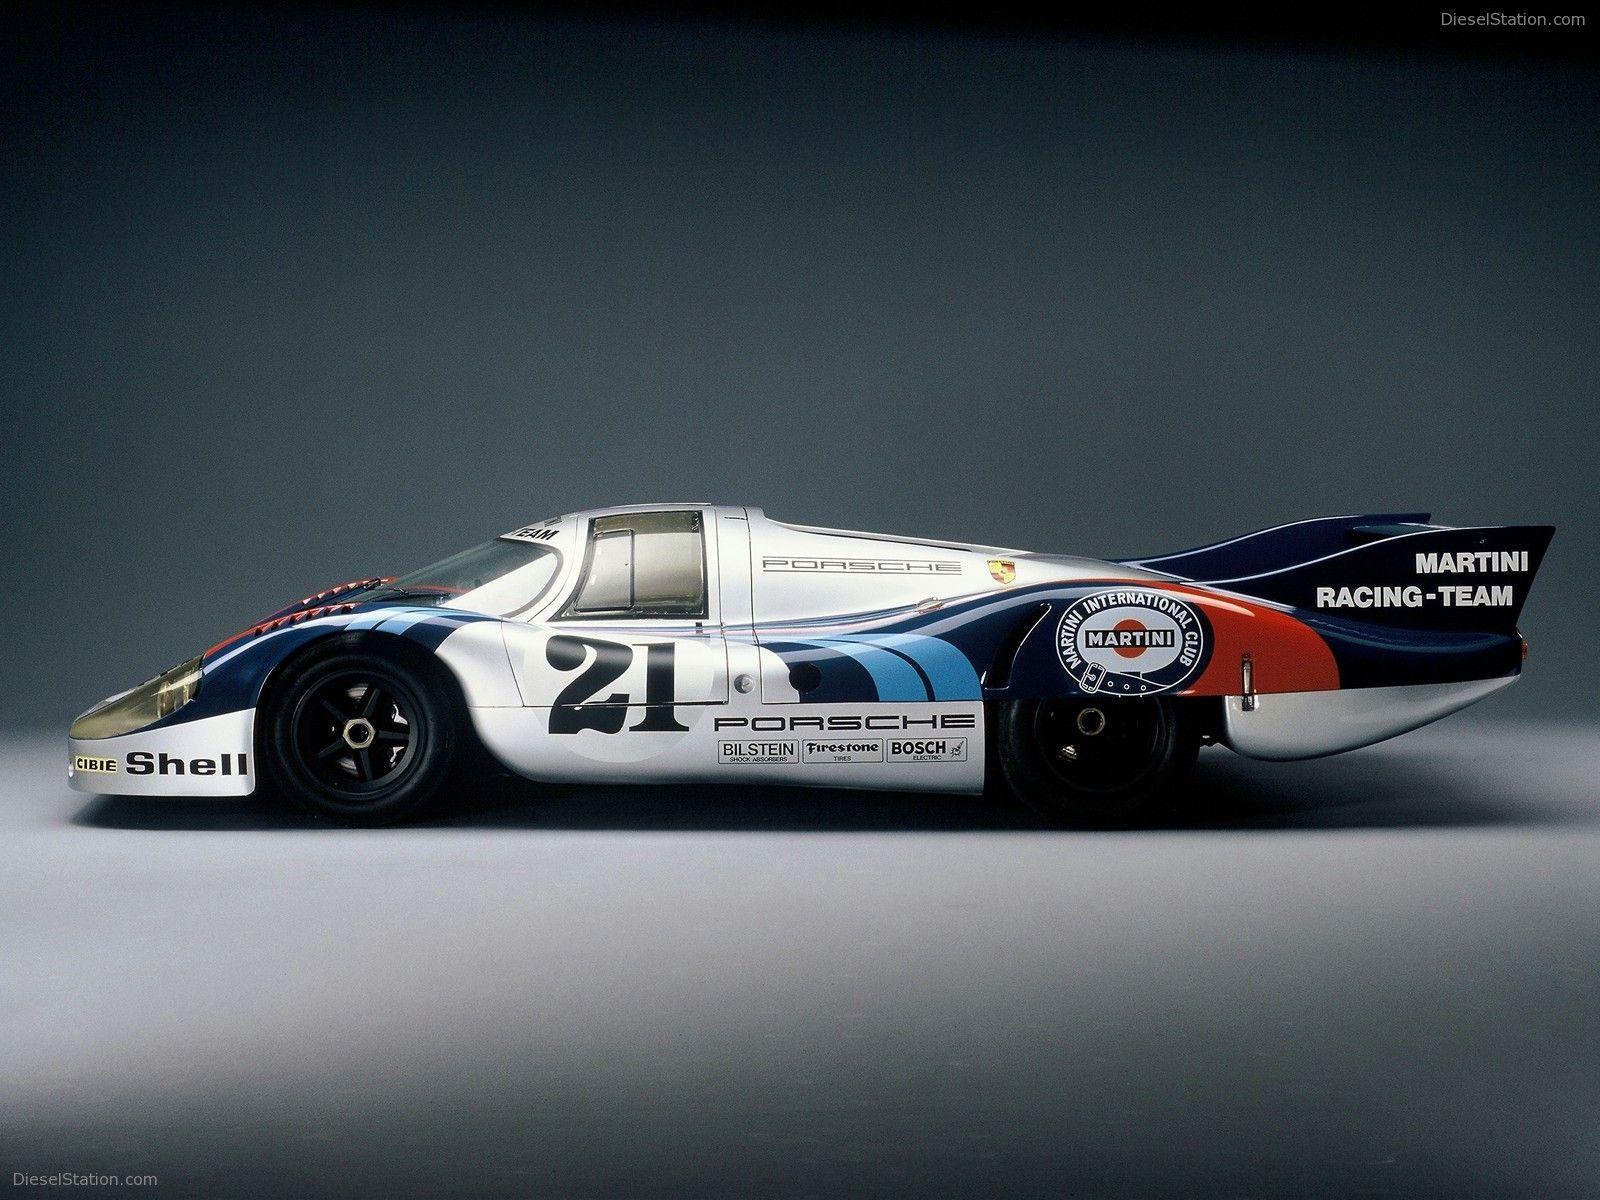 Porsche-917-Greatest-Racing-Car-in-History-10.jpg (1600×1200)